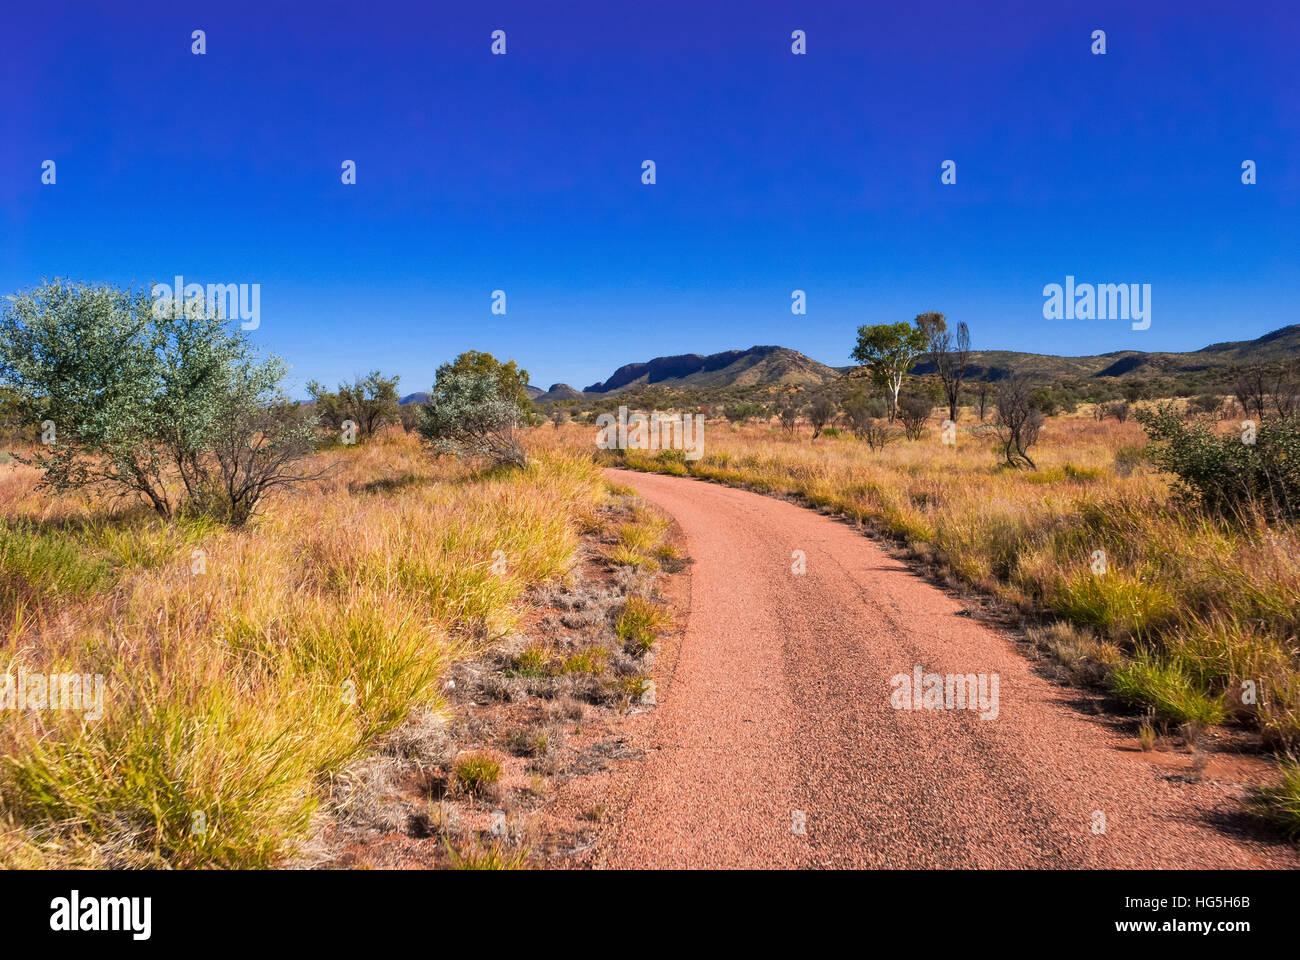 Australia, outback - Stock Image